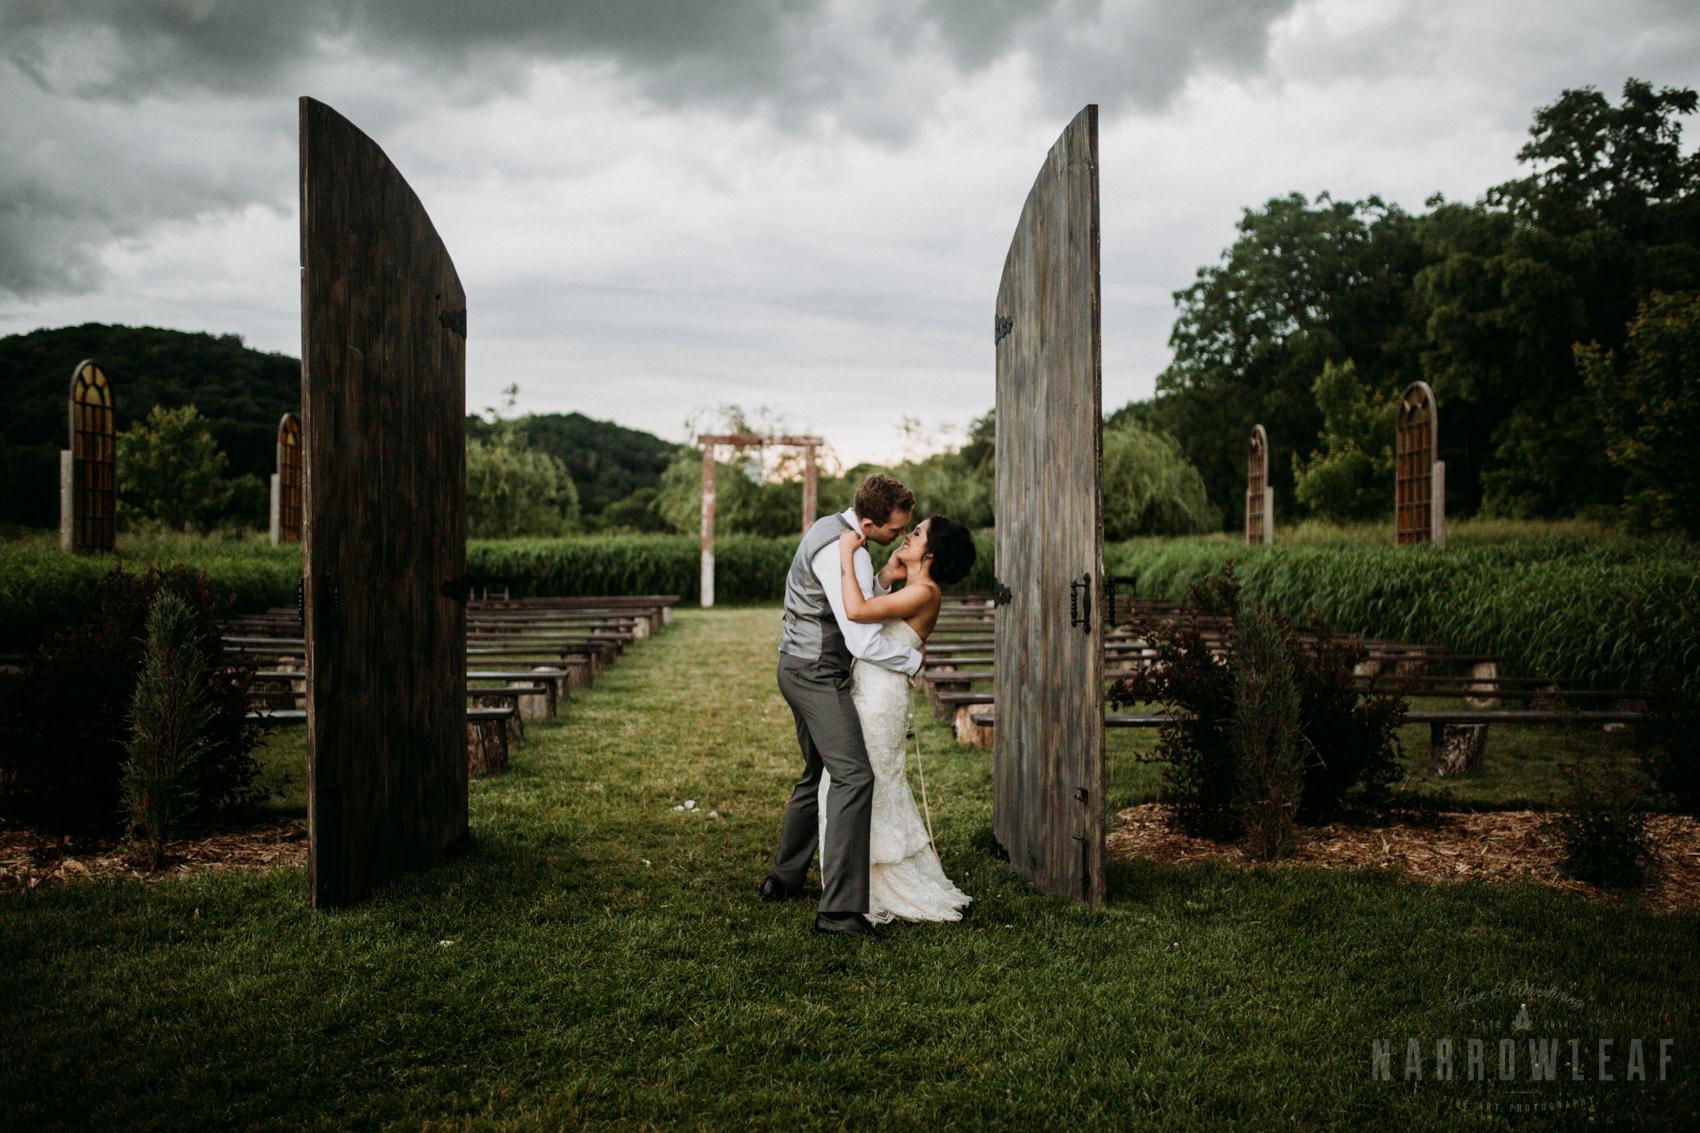 moody-bride-groom-photos-the-hidden-meadow-and-barn-pepin-wi-18.jpg